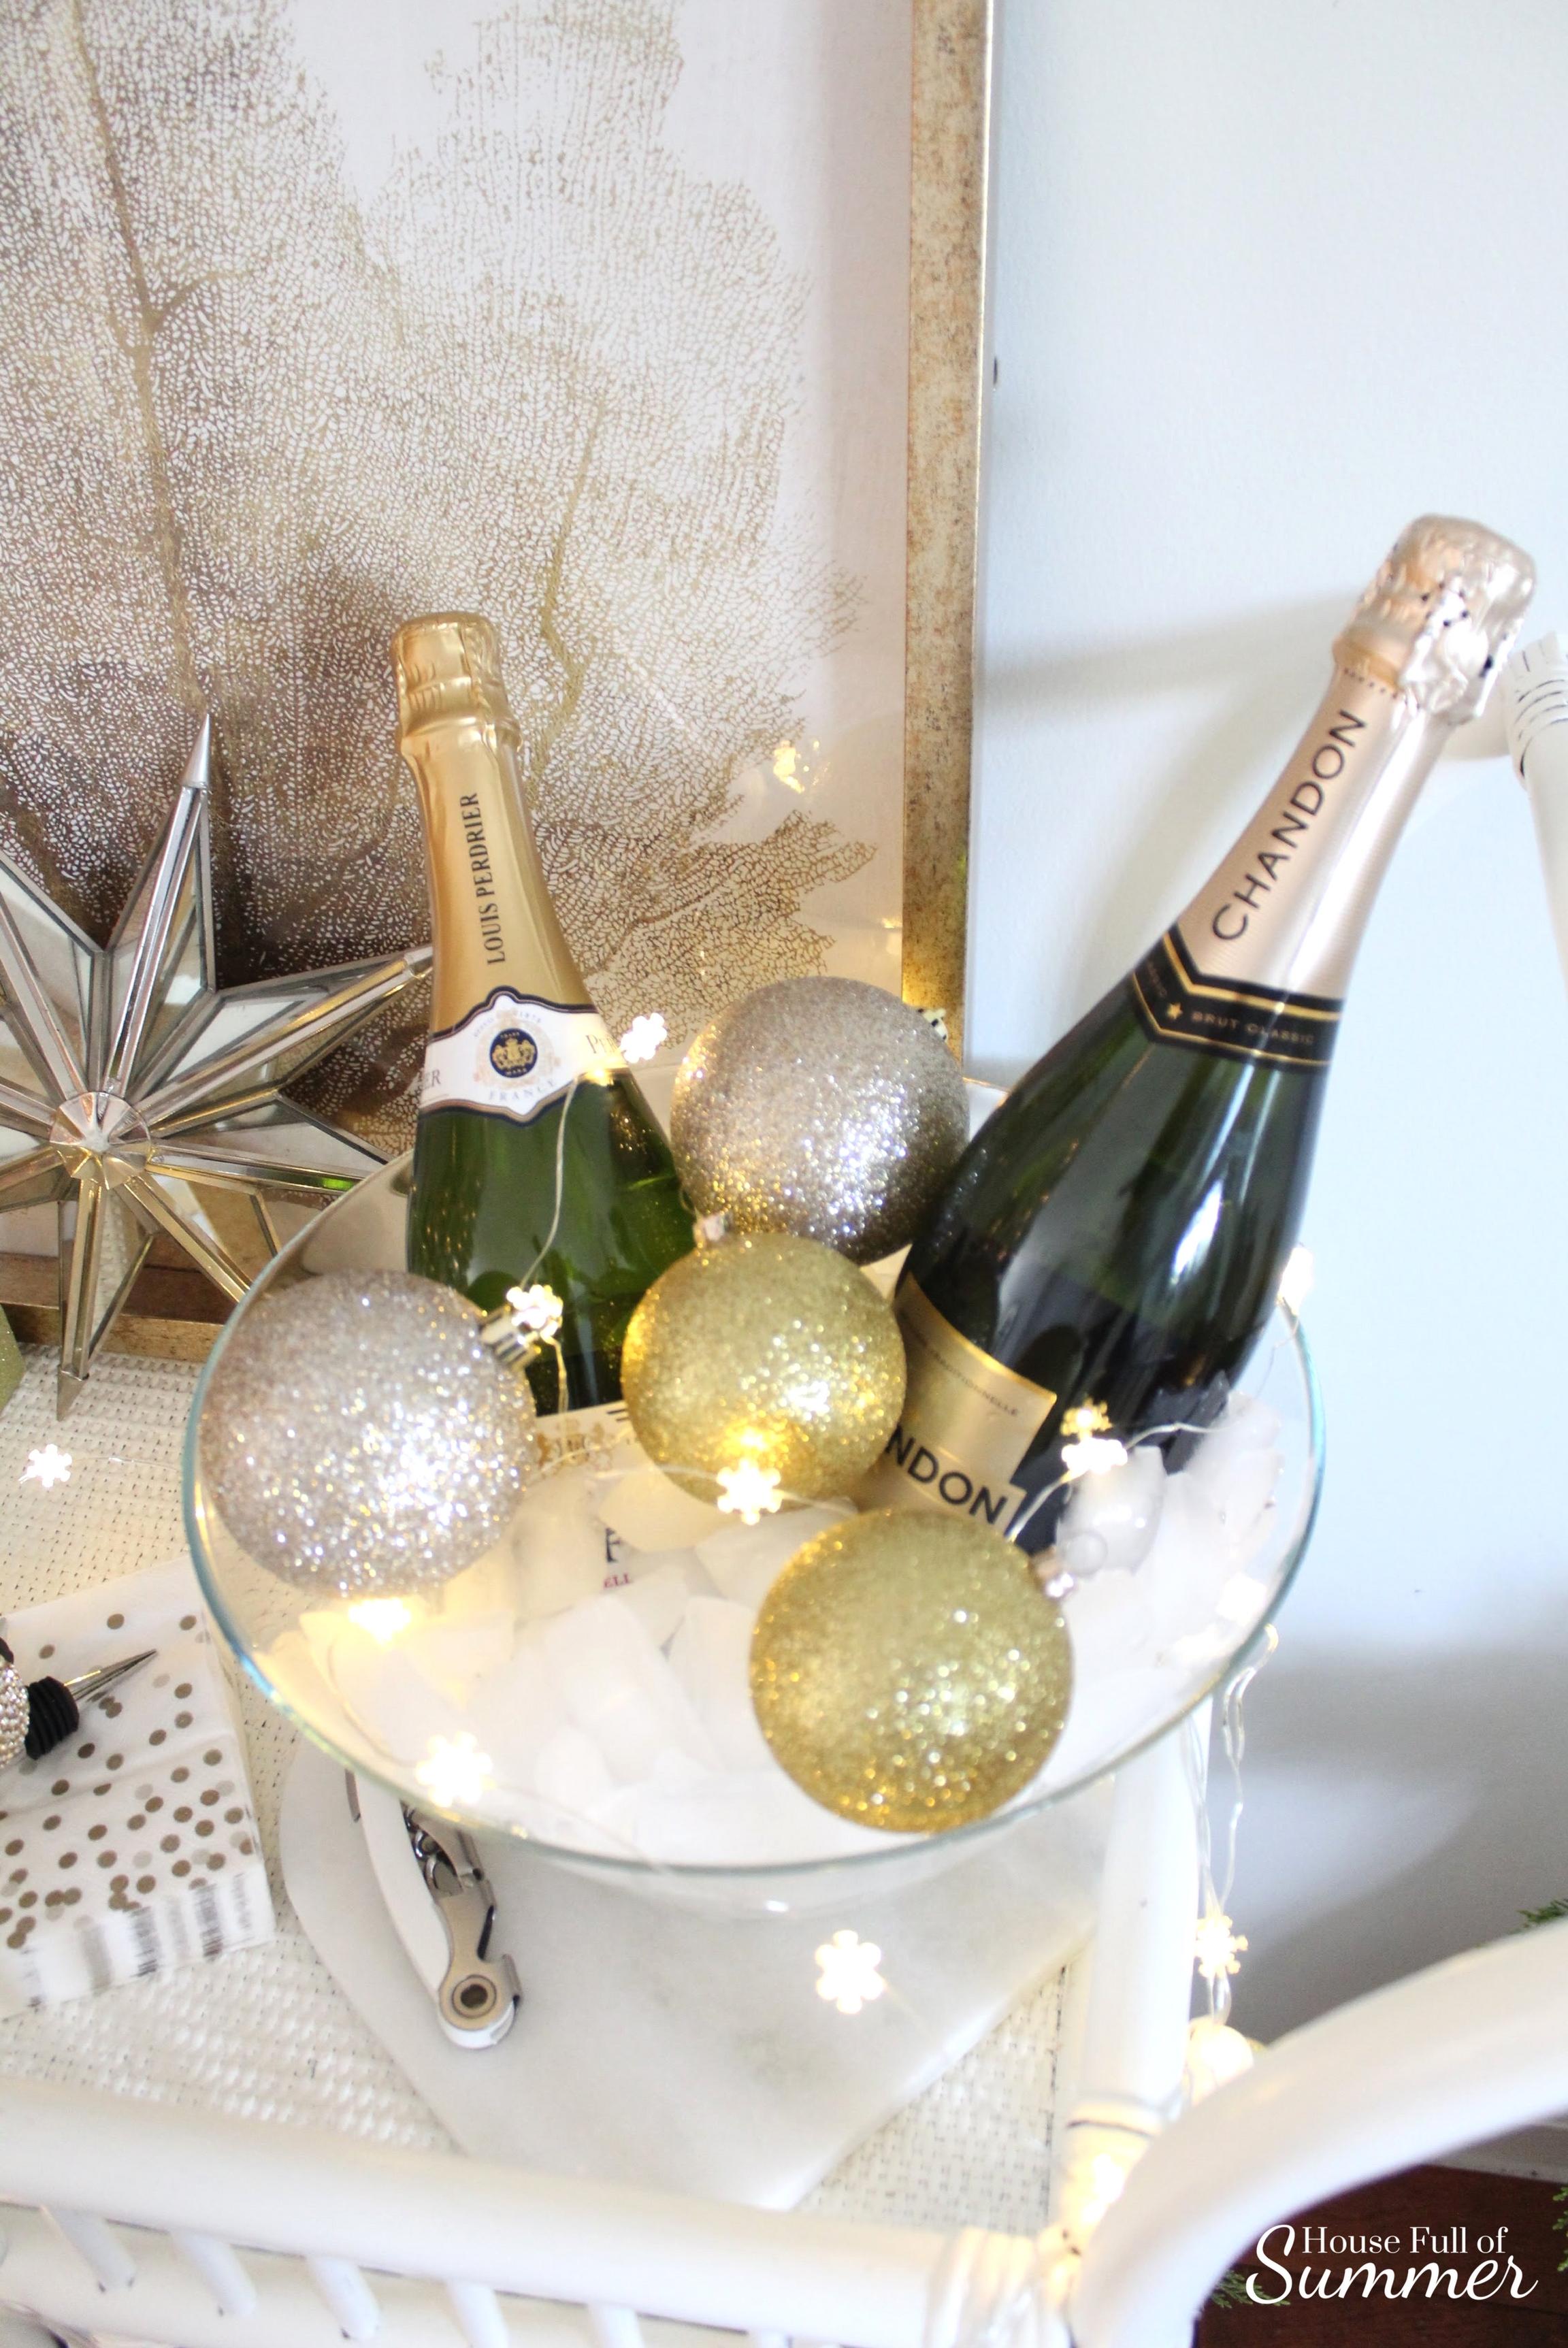 House Full of Summer | NYE Bar Cart Blog Hop - silver and gold new year's eve decor, ice bucket, champagne, coastal style, coastal NYE, holiday bar cart, fairy lights, string light ideas